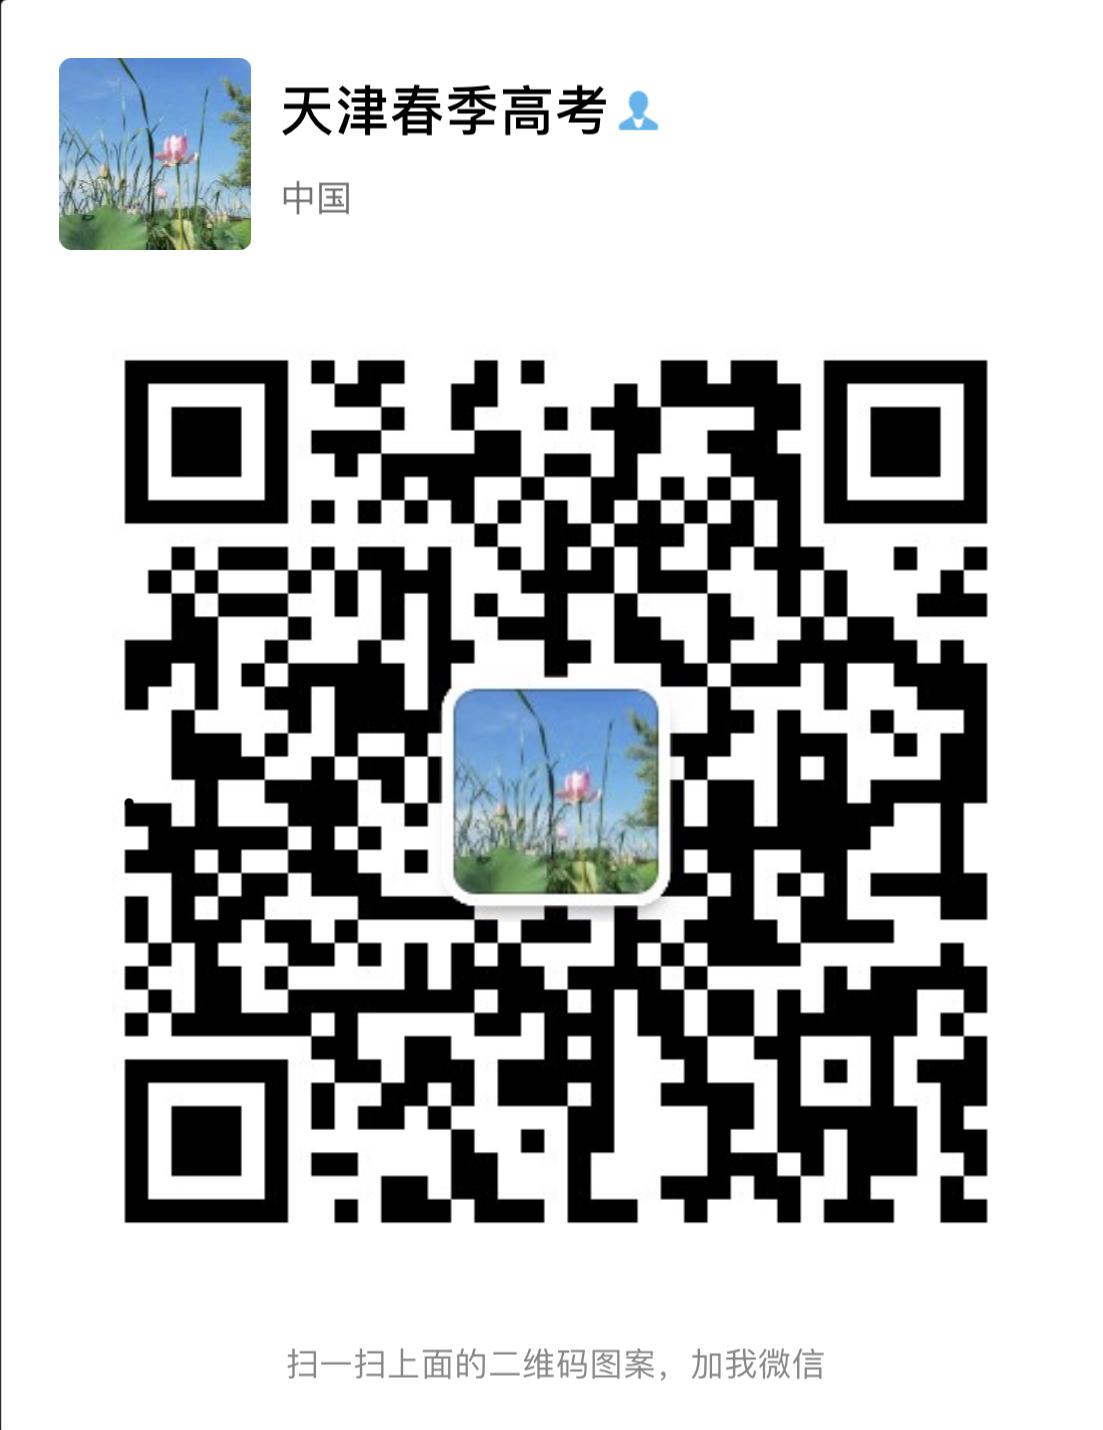 IMG_0946(20181106-174405).jpg